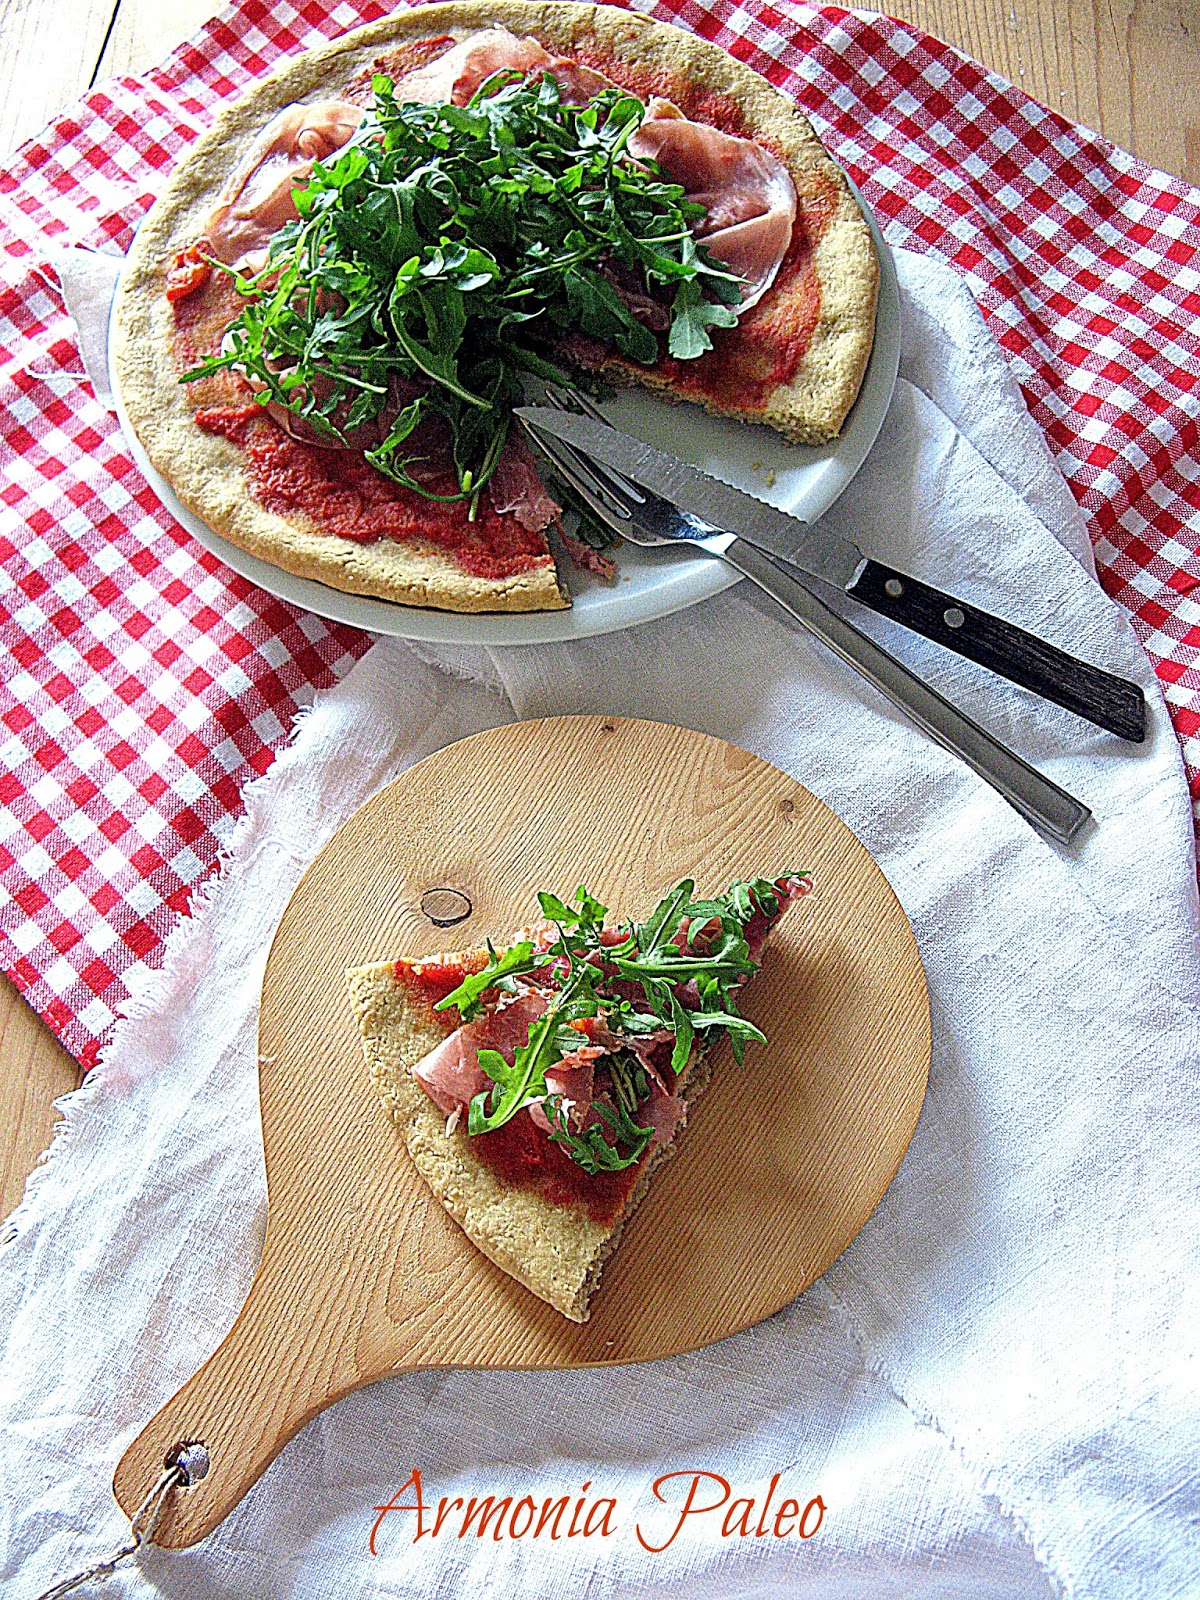 Pizza Paleo di Armonia Paleo